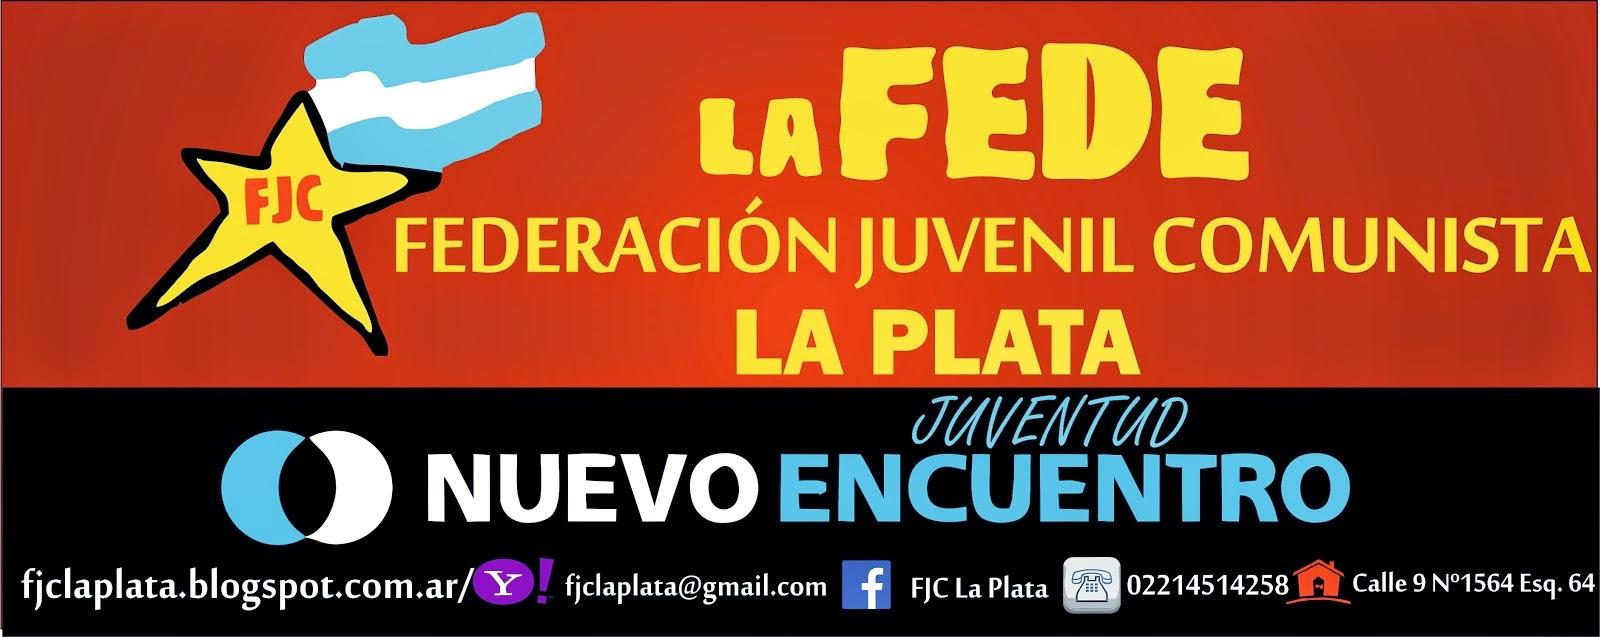 FJC La Plata